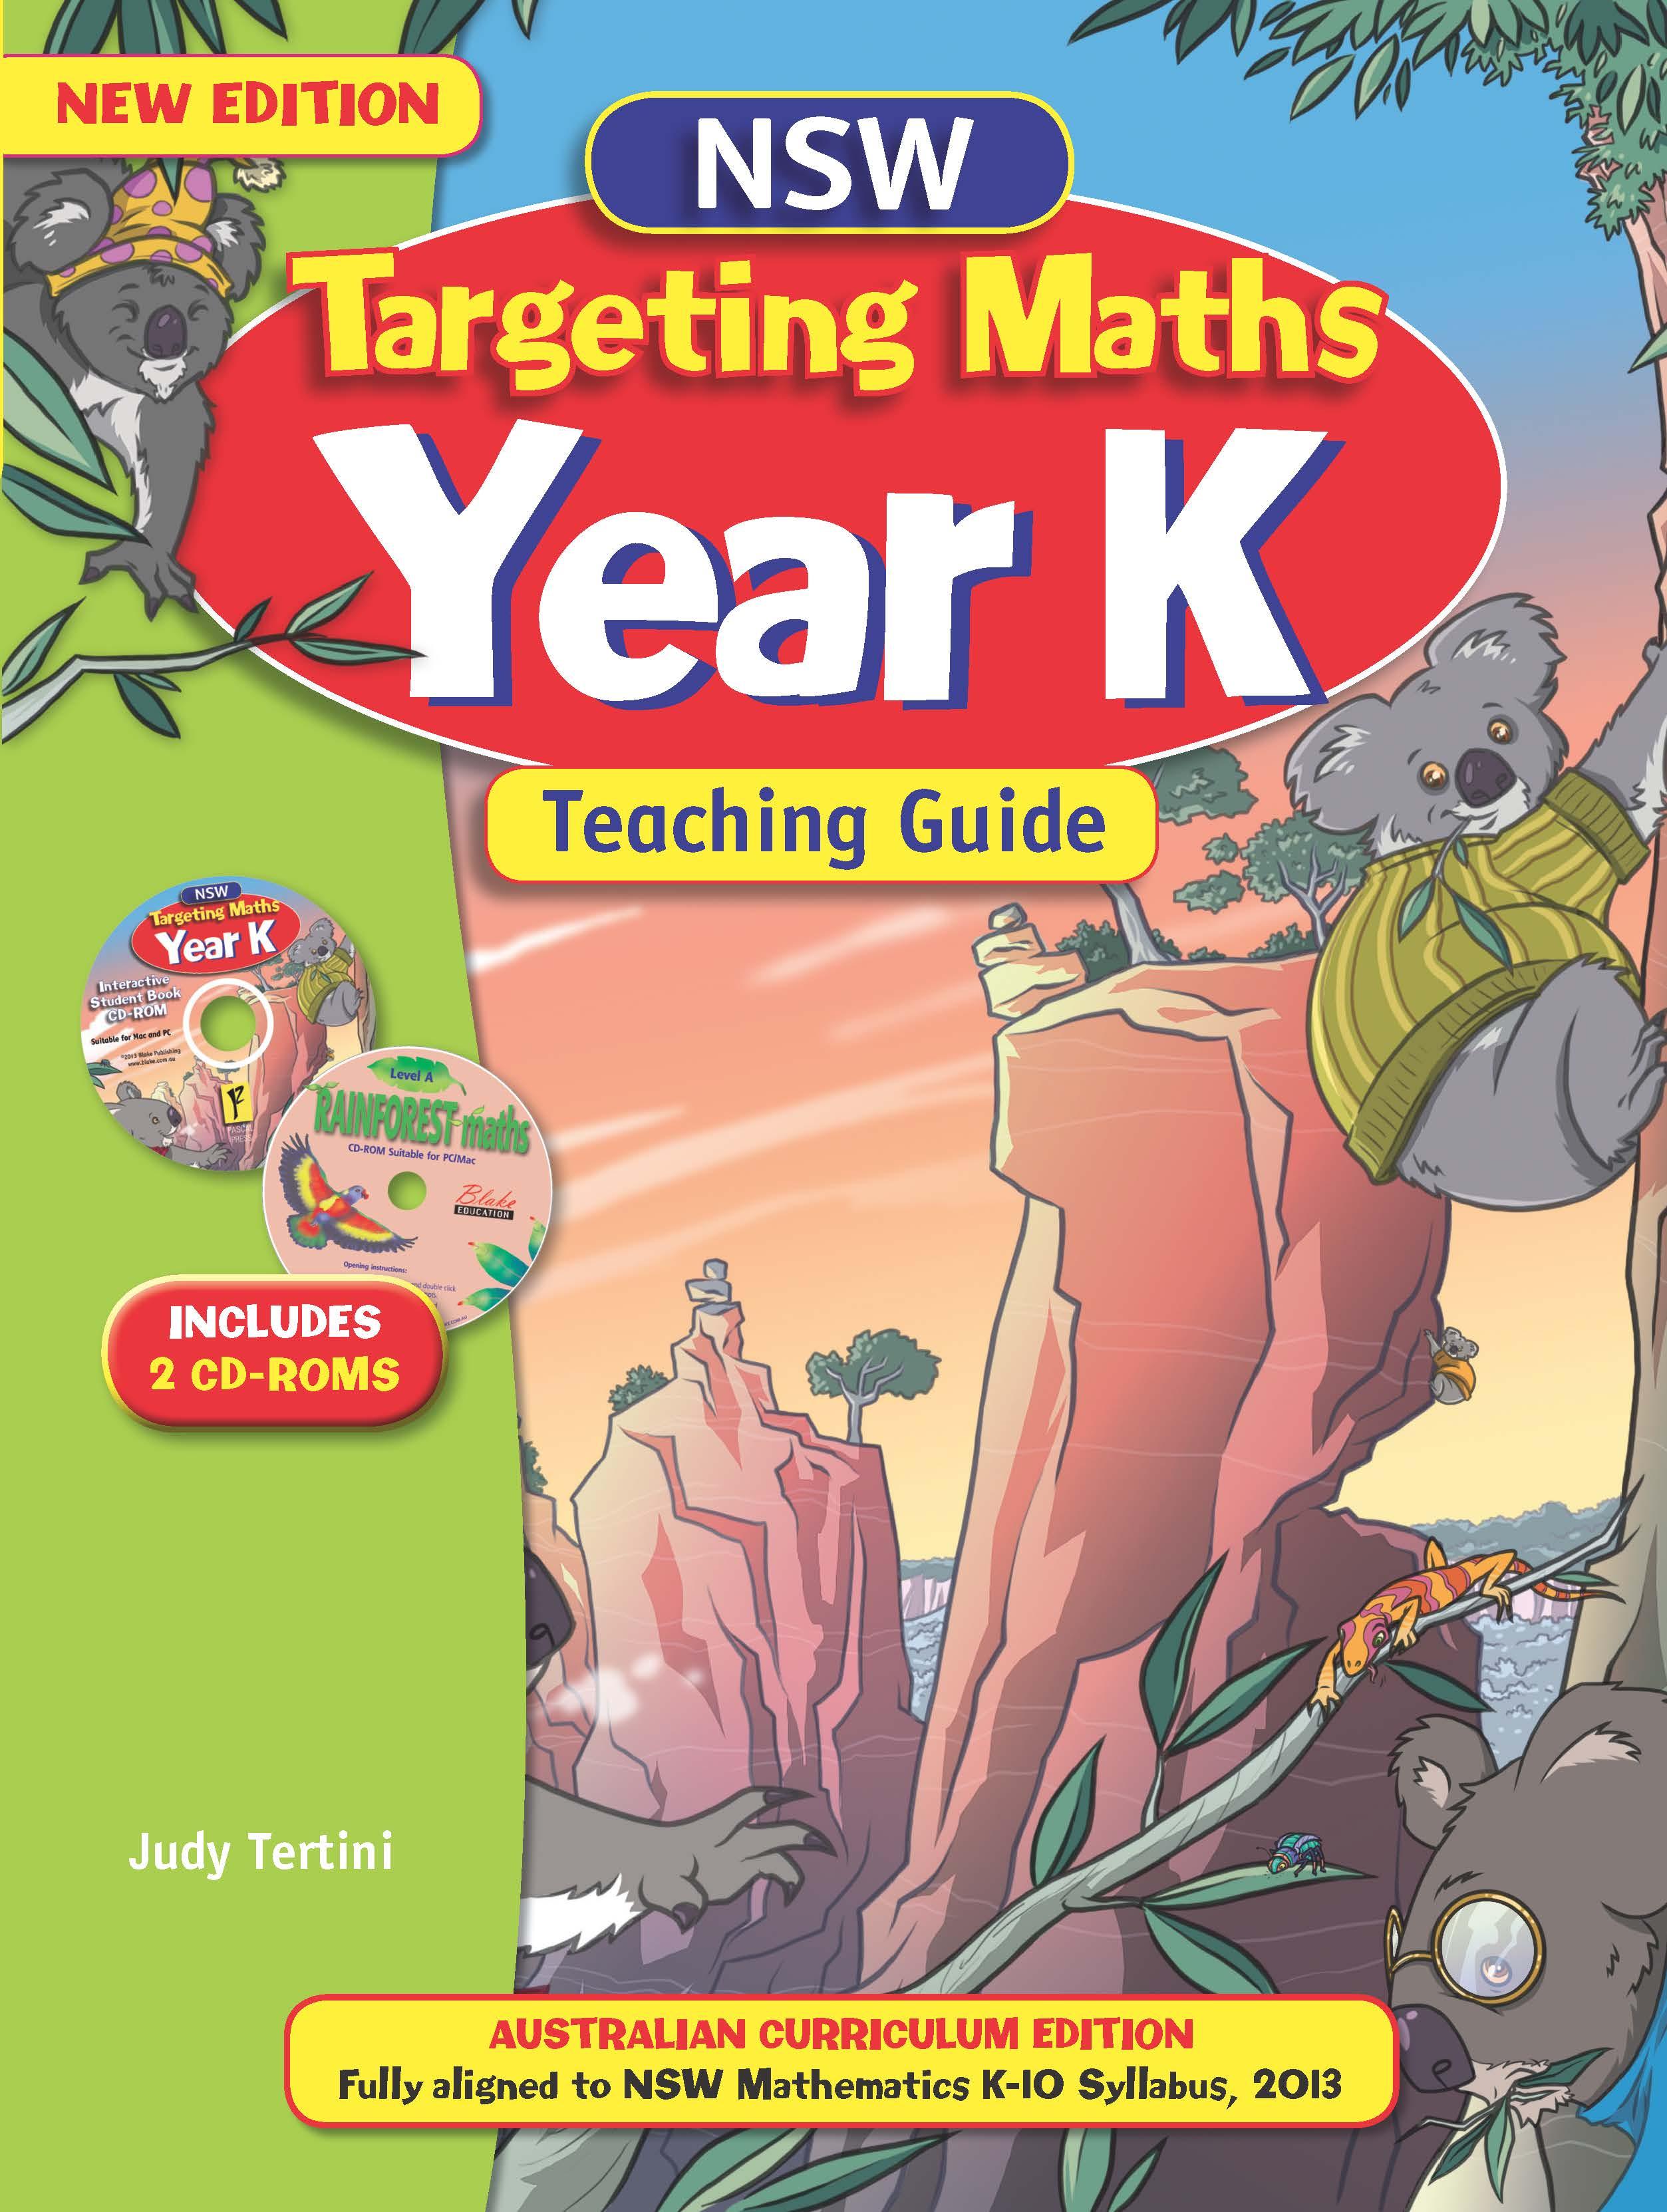 NSW Targeting Maths Australian Curriculum Teaching Guide Year K